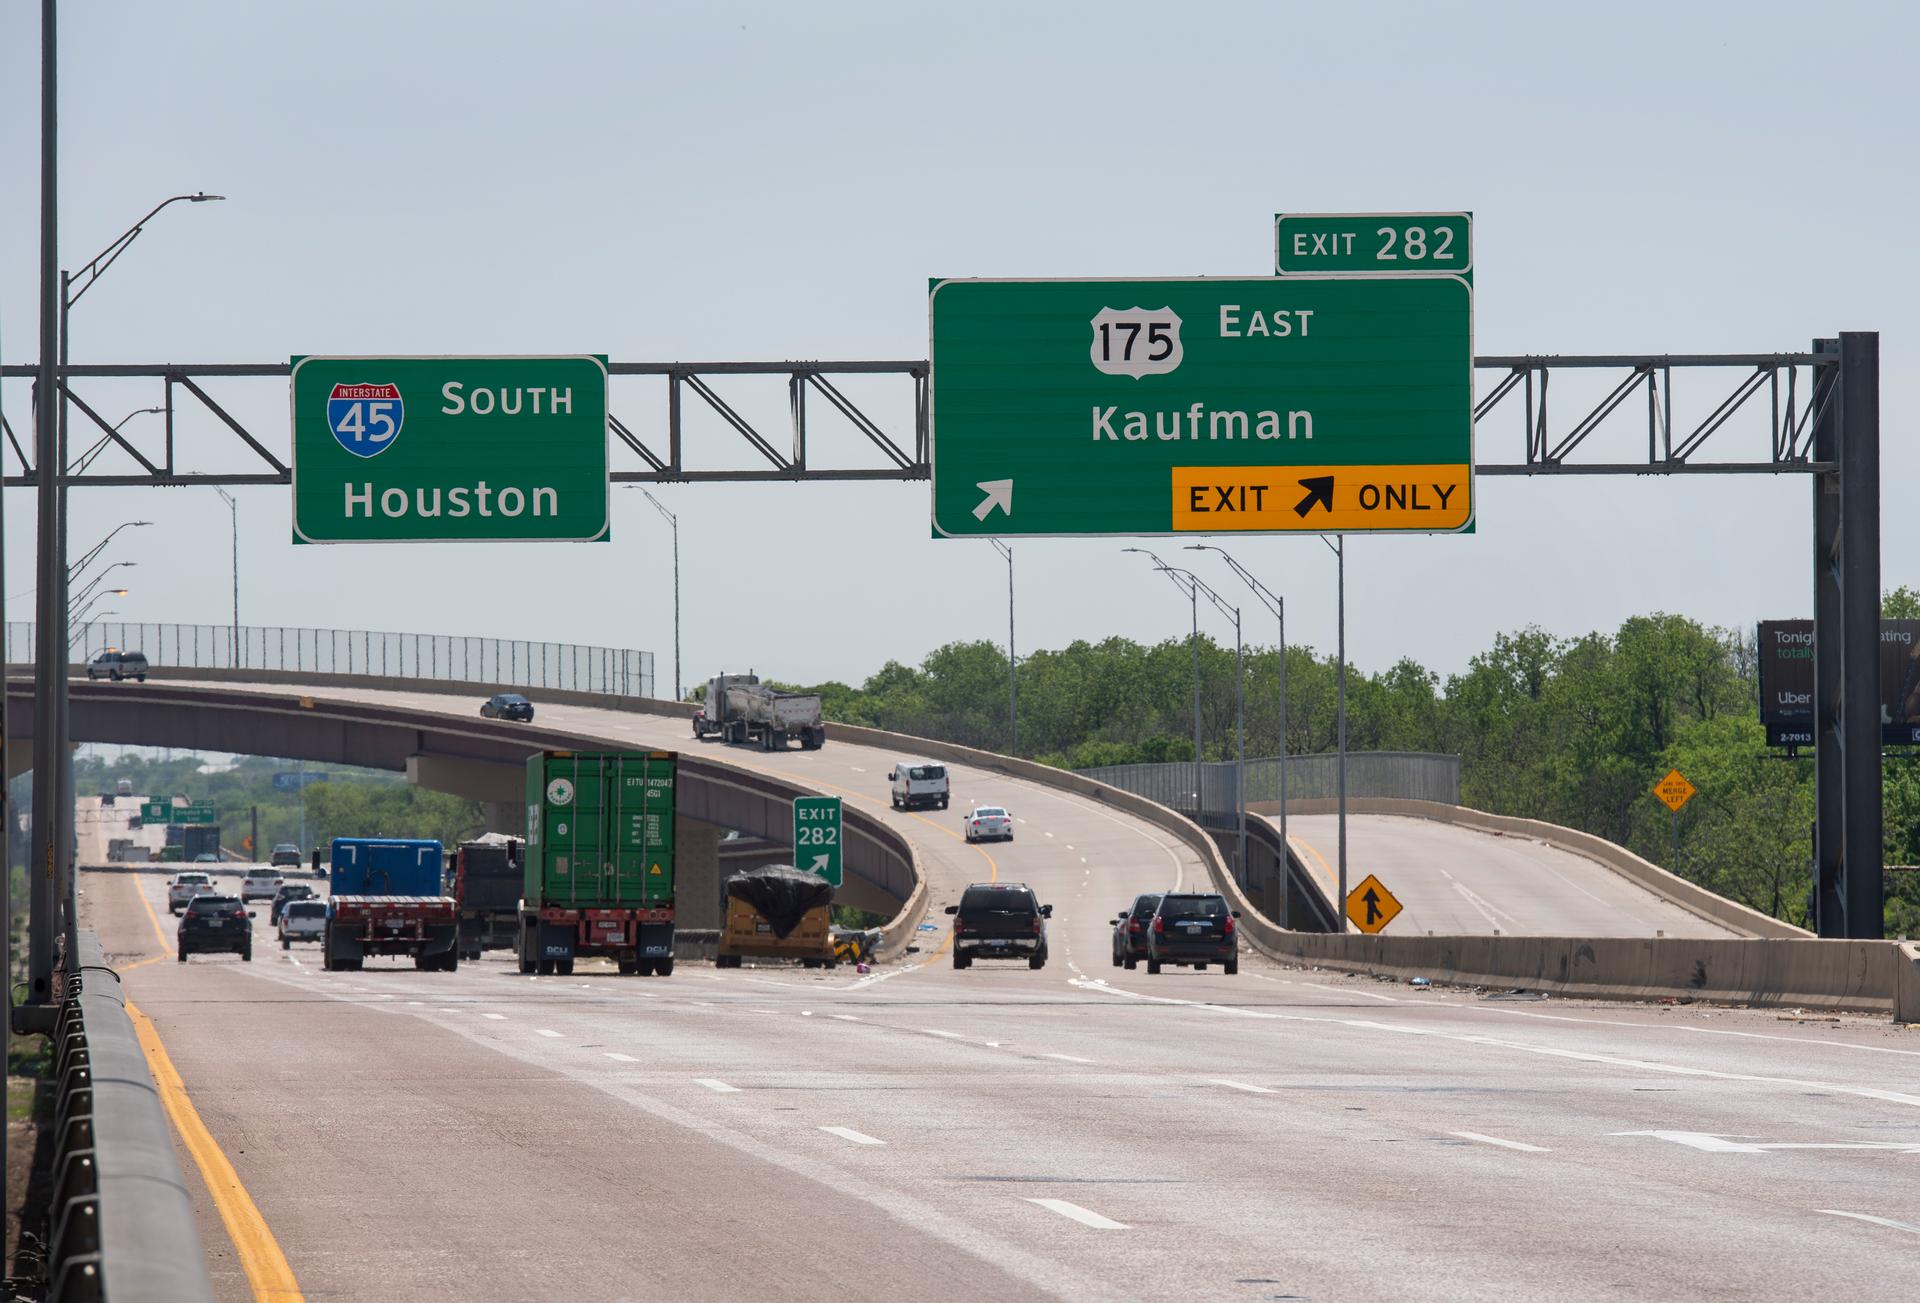 U.S. 175 Wright freeway Dallas Texas